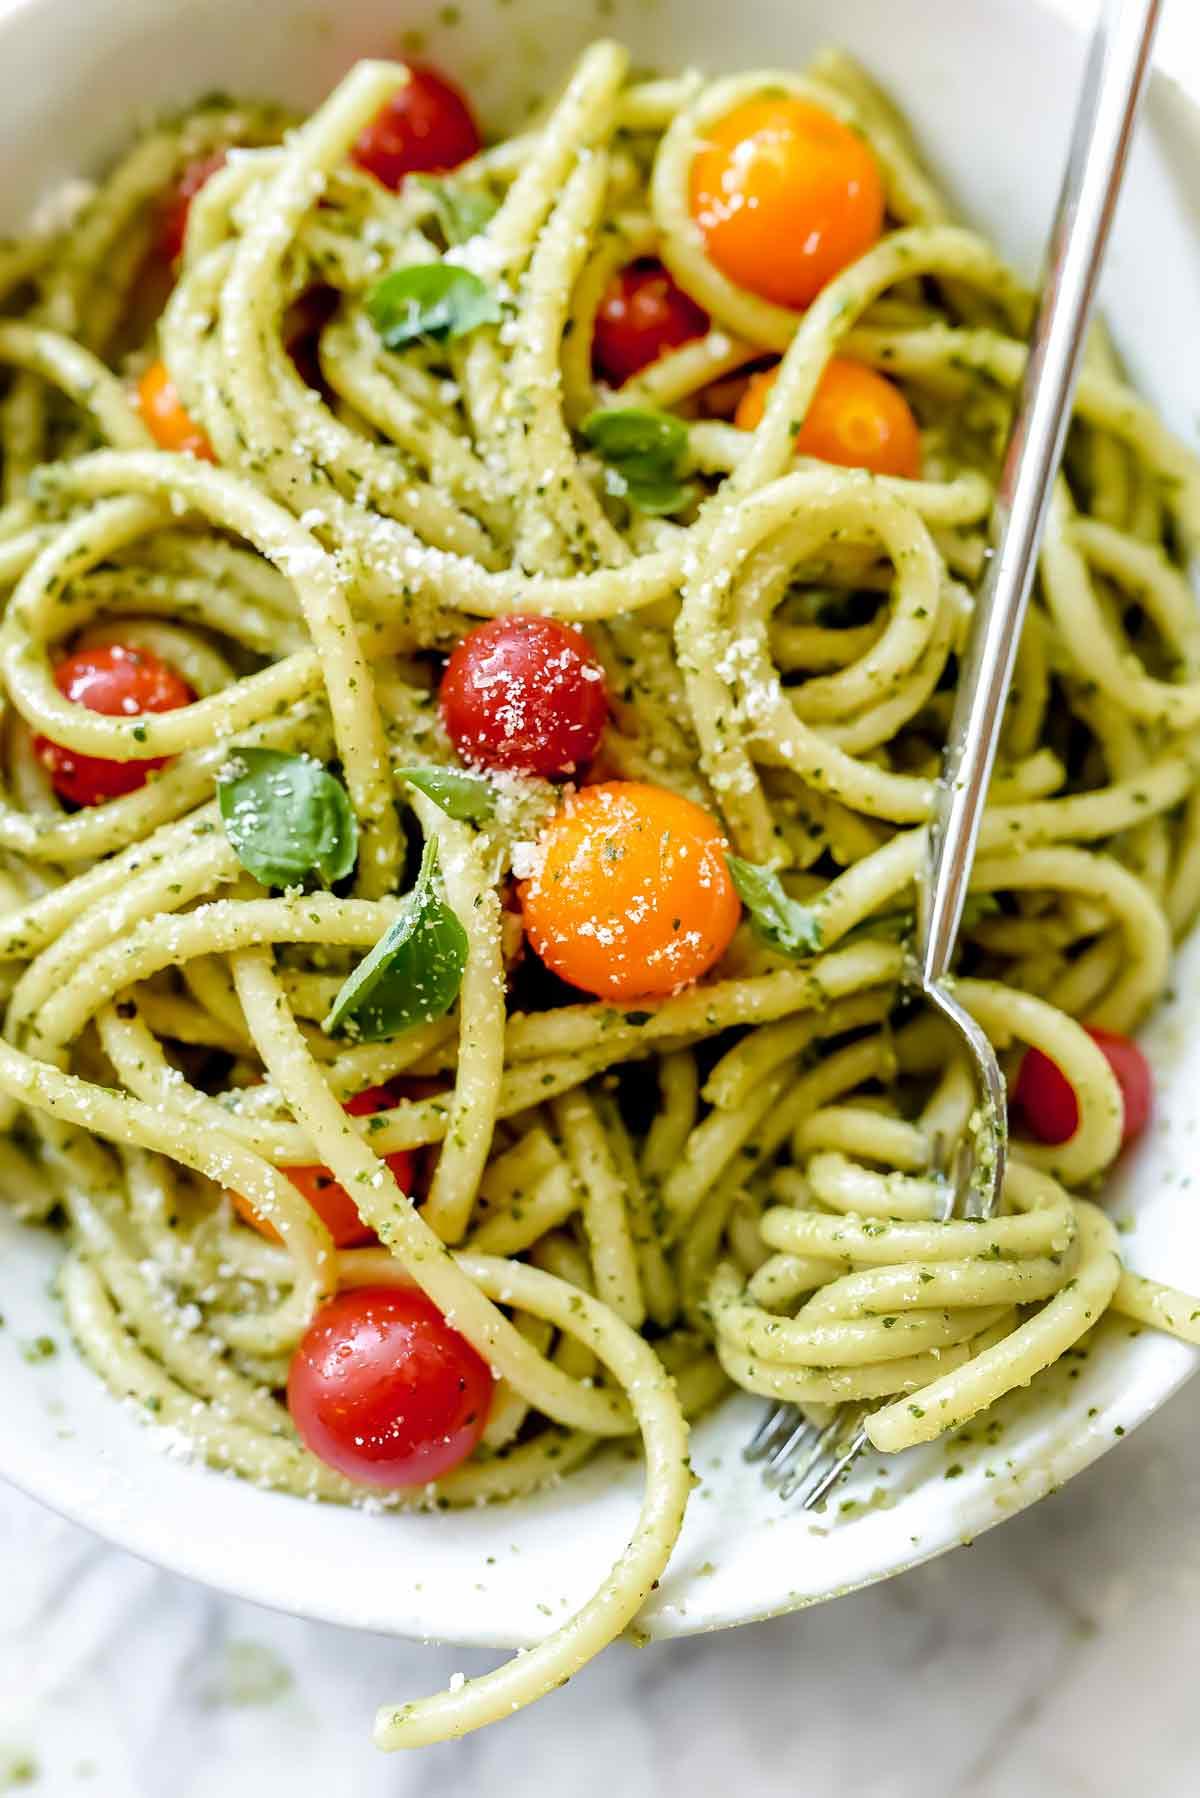 Easy Homemade Pesto Pasta Recipe